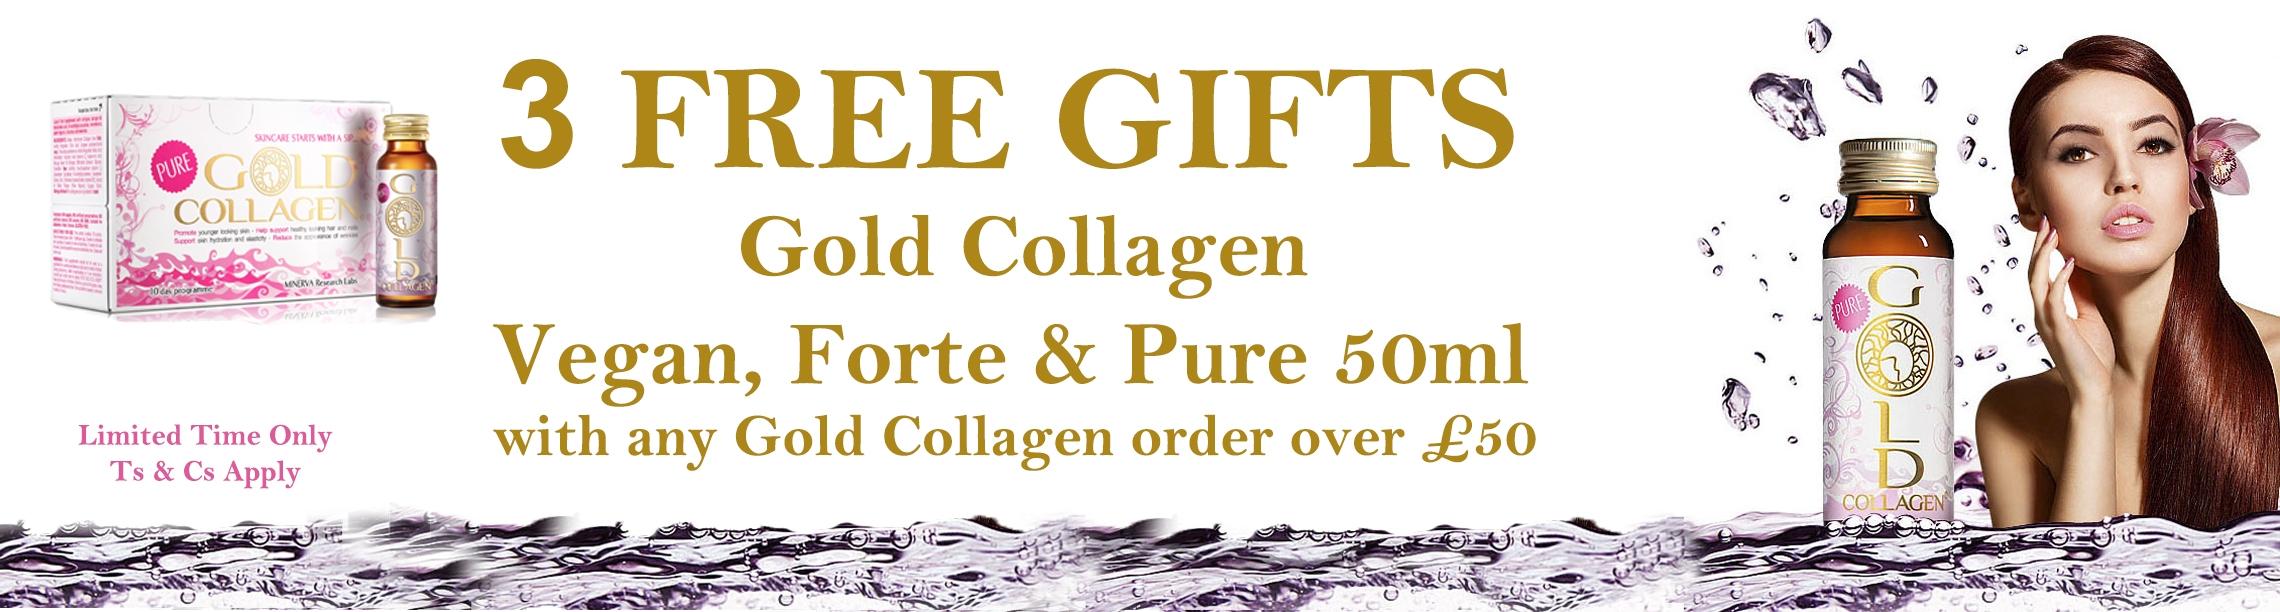 Gold collagen free gift